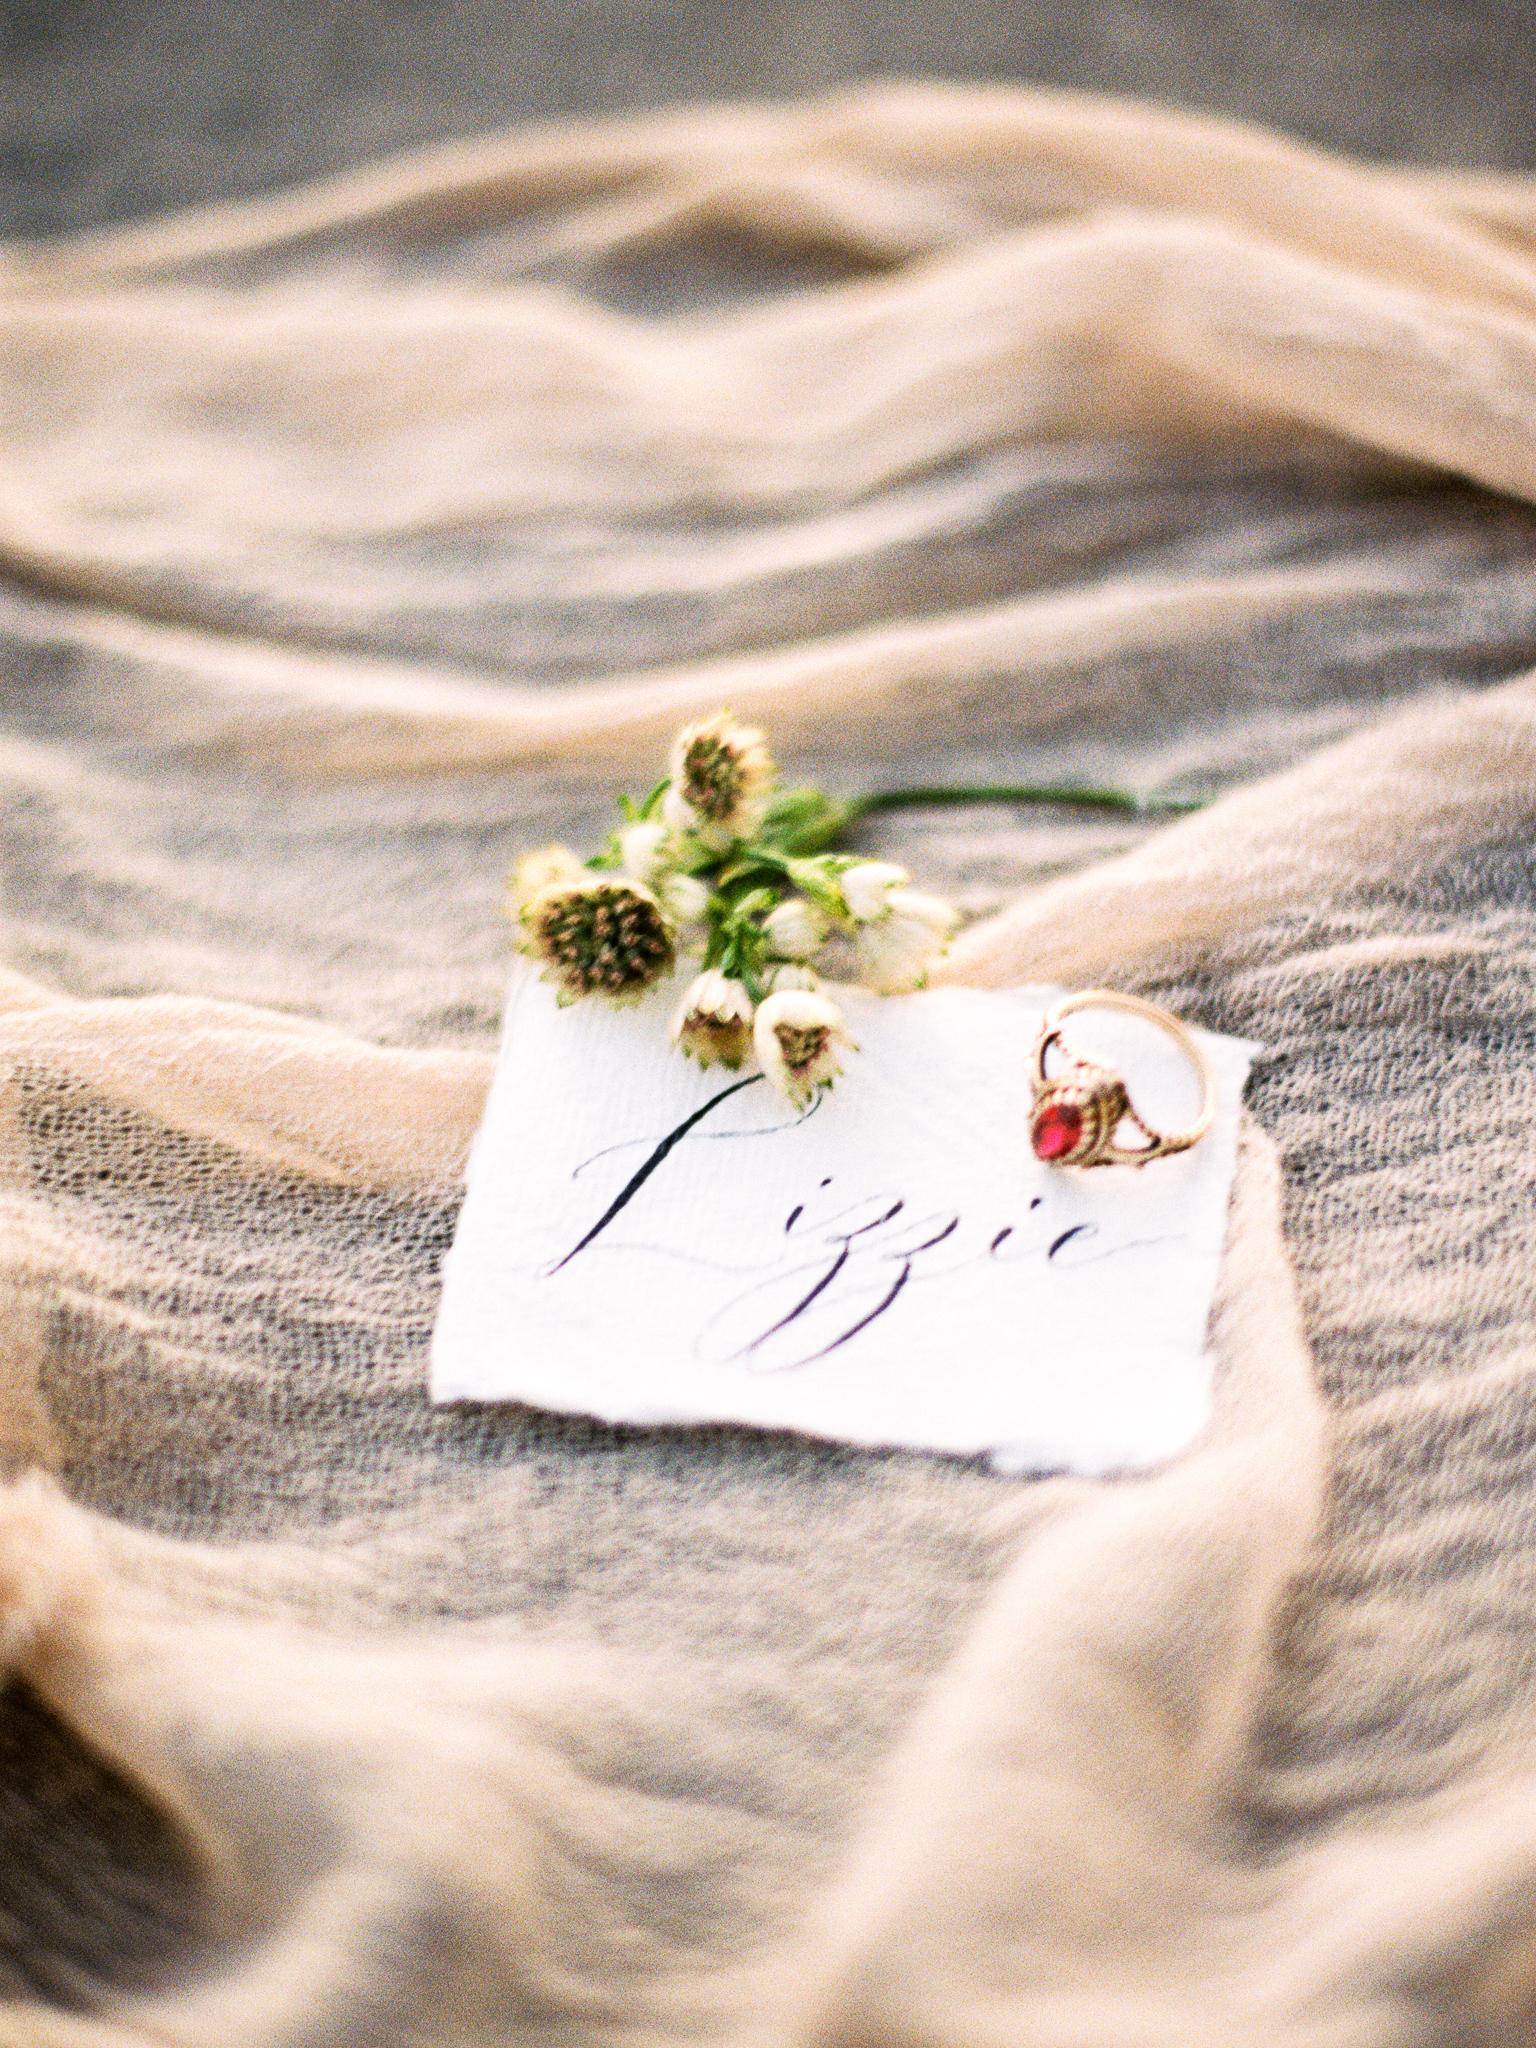 christinadavis+weddinginspiration24.jpg